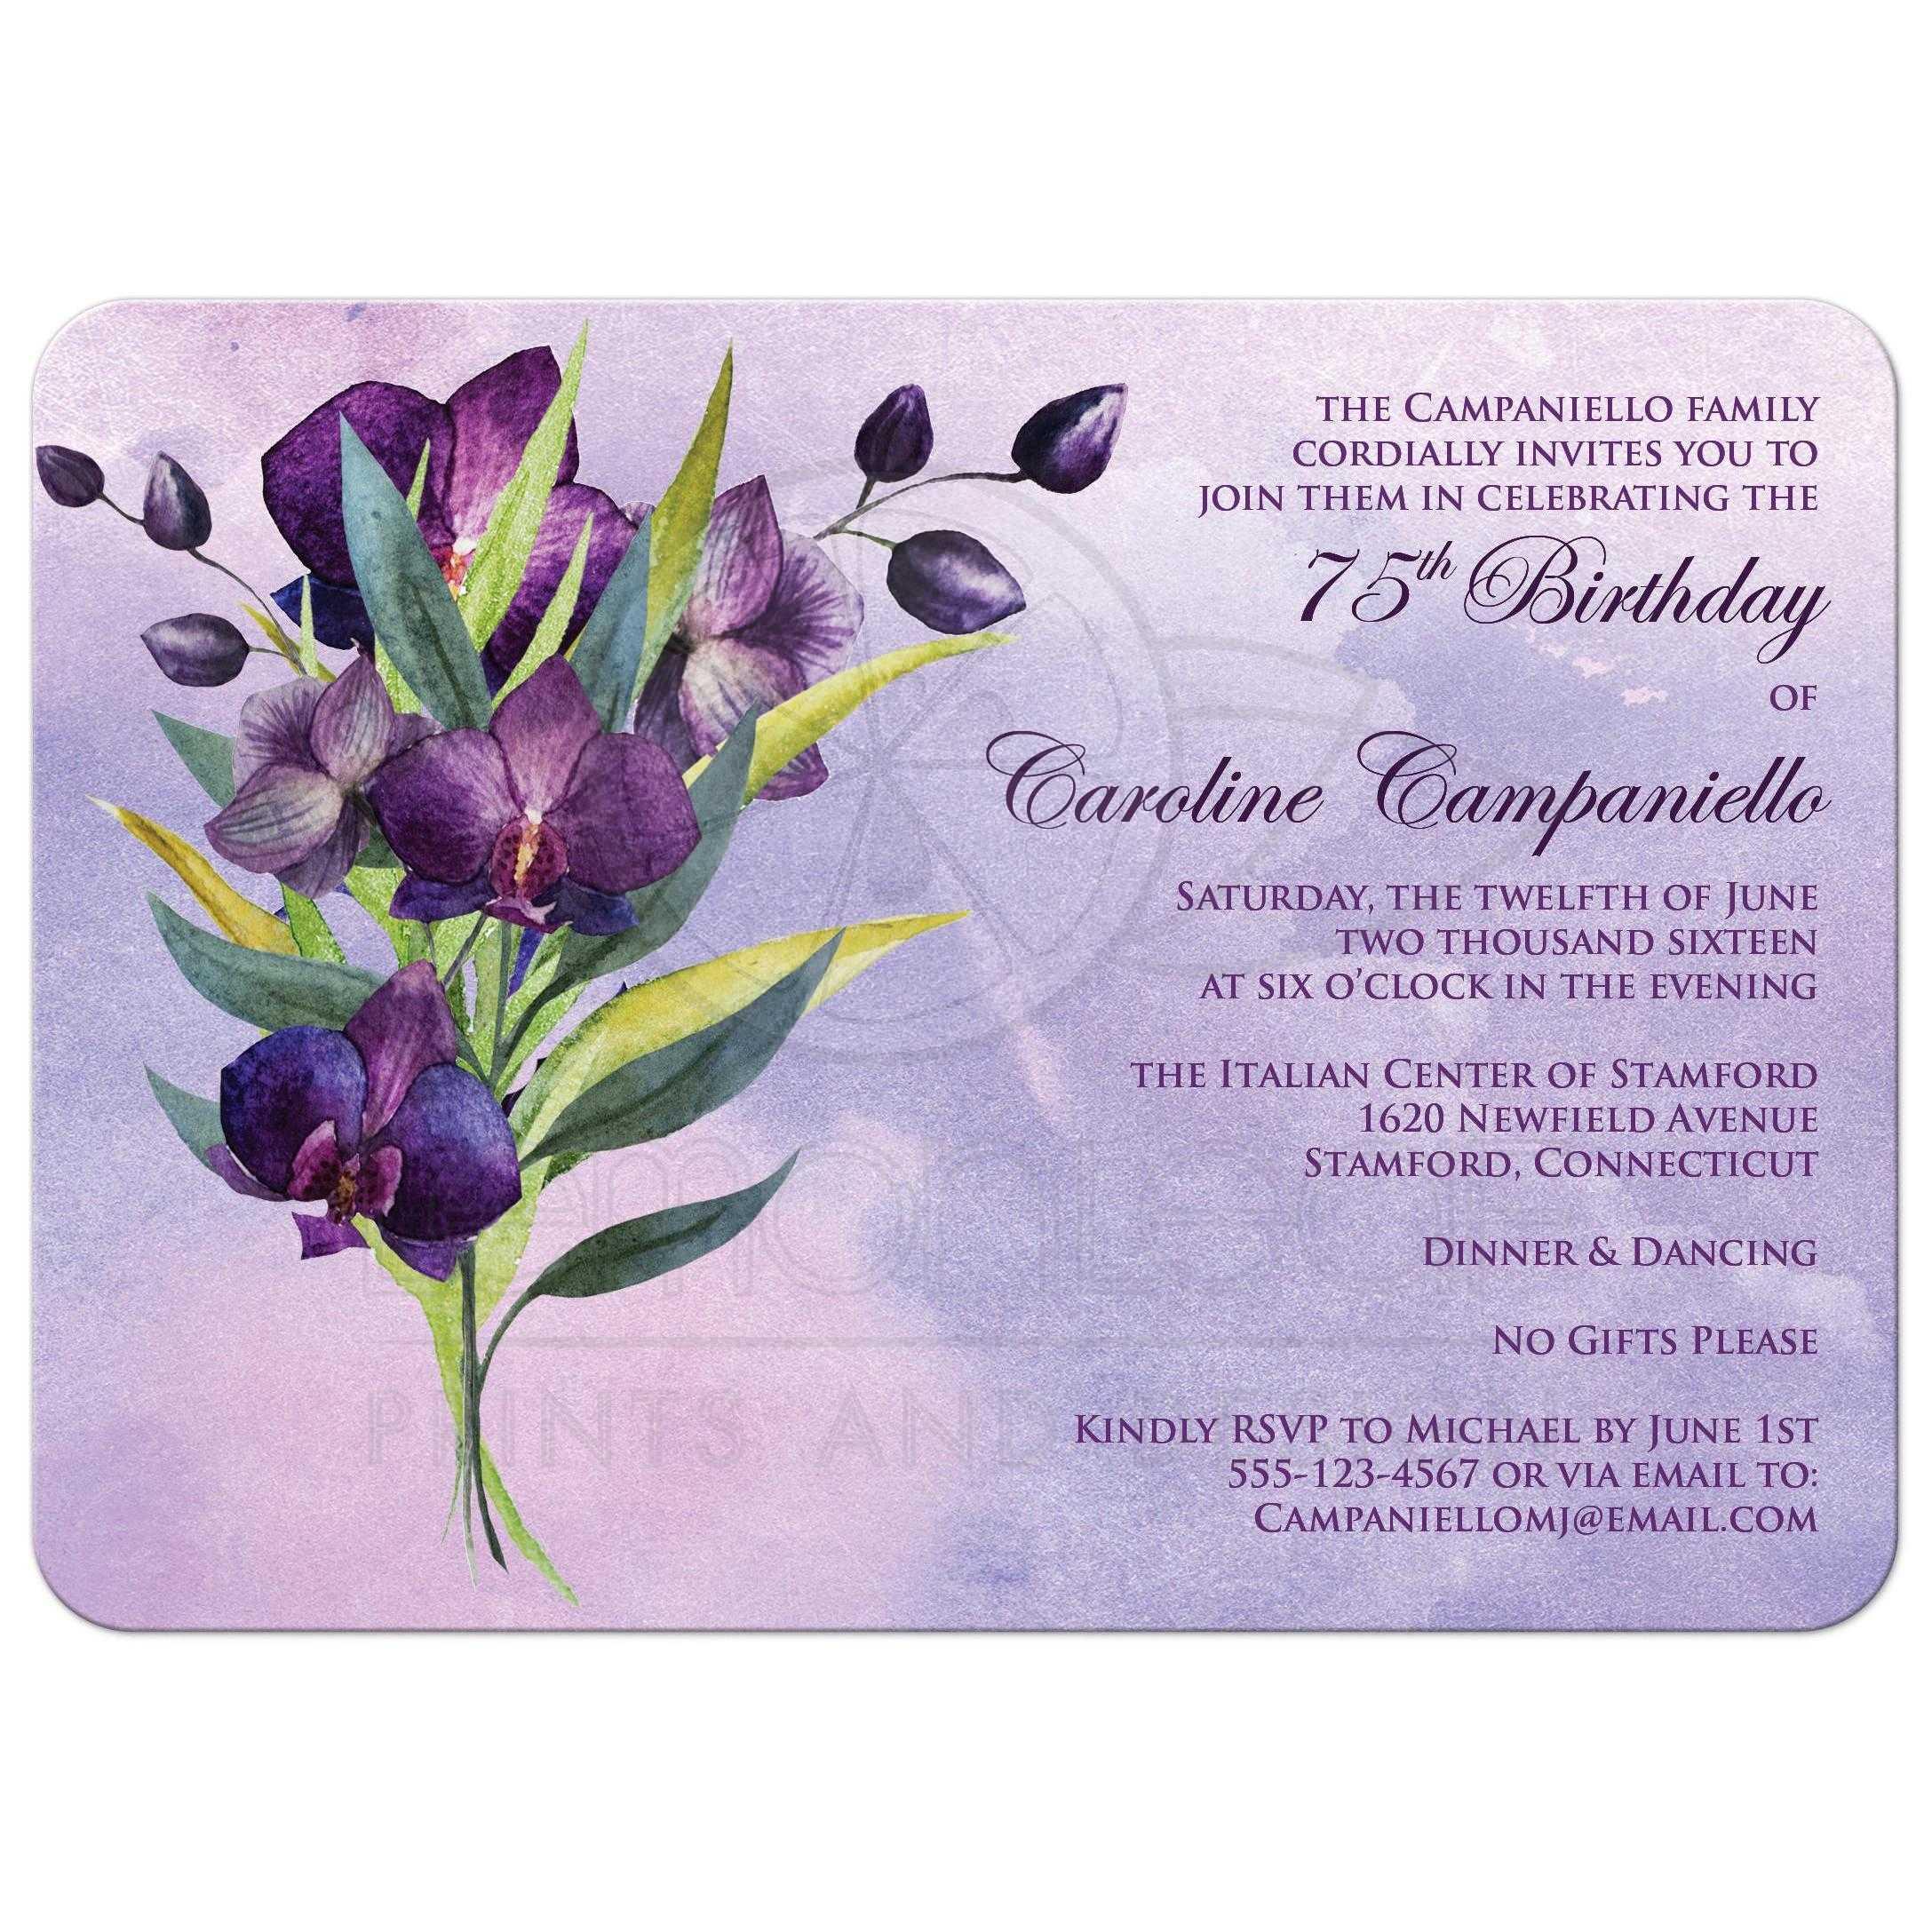 75th Birthday Party Invitation Purple Orchids Green Foliage